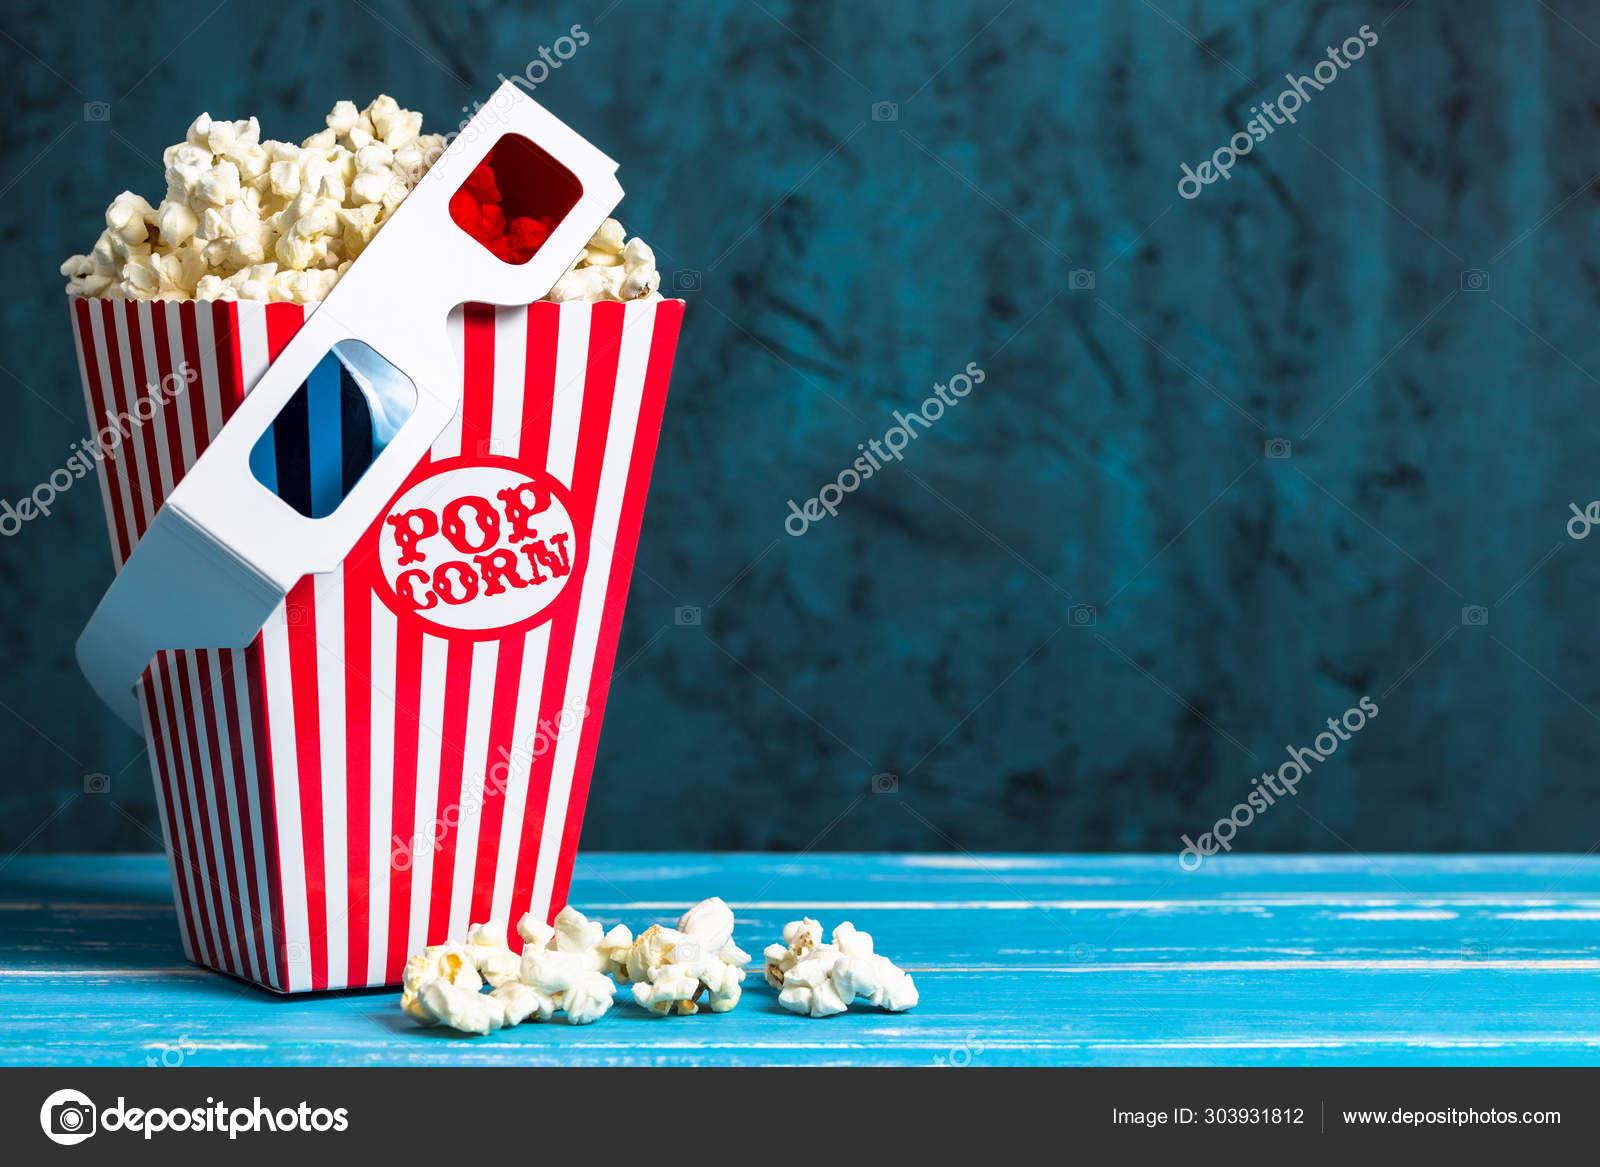 Popcorn Bucket Glasses Copy Space Blue Background Stock Photo Image By C Photopsist 303931812